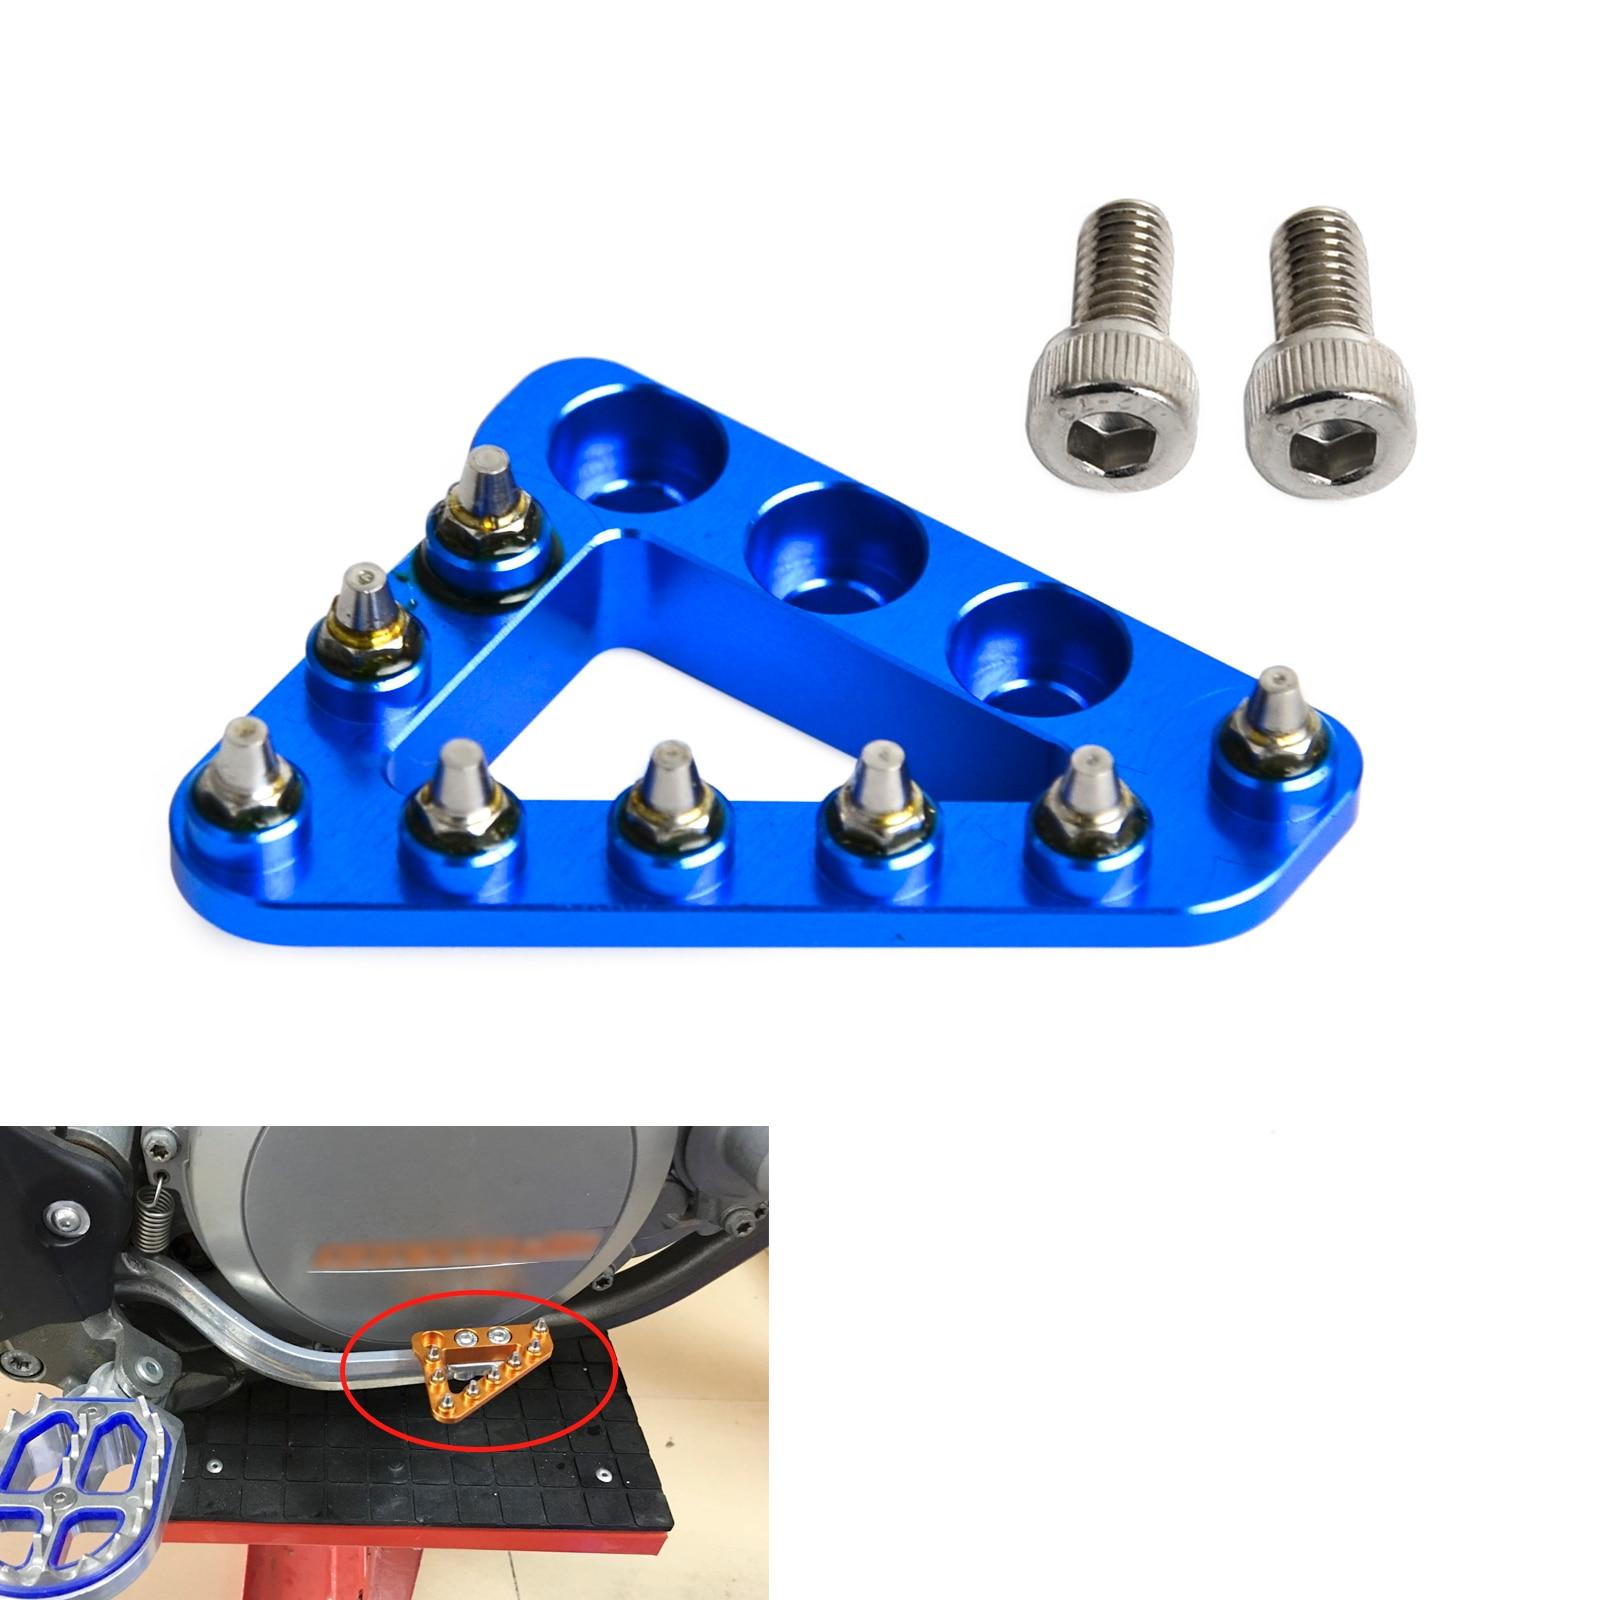 Motorcycle Rear Foot Brake Pedal Lever Step Tip Plate For Sherco 125 250 300 450 500 SC SE SCF SEF Factory SEFR 2014-2020 2019